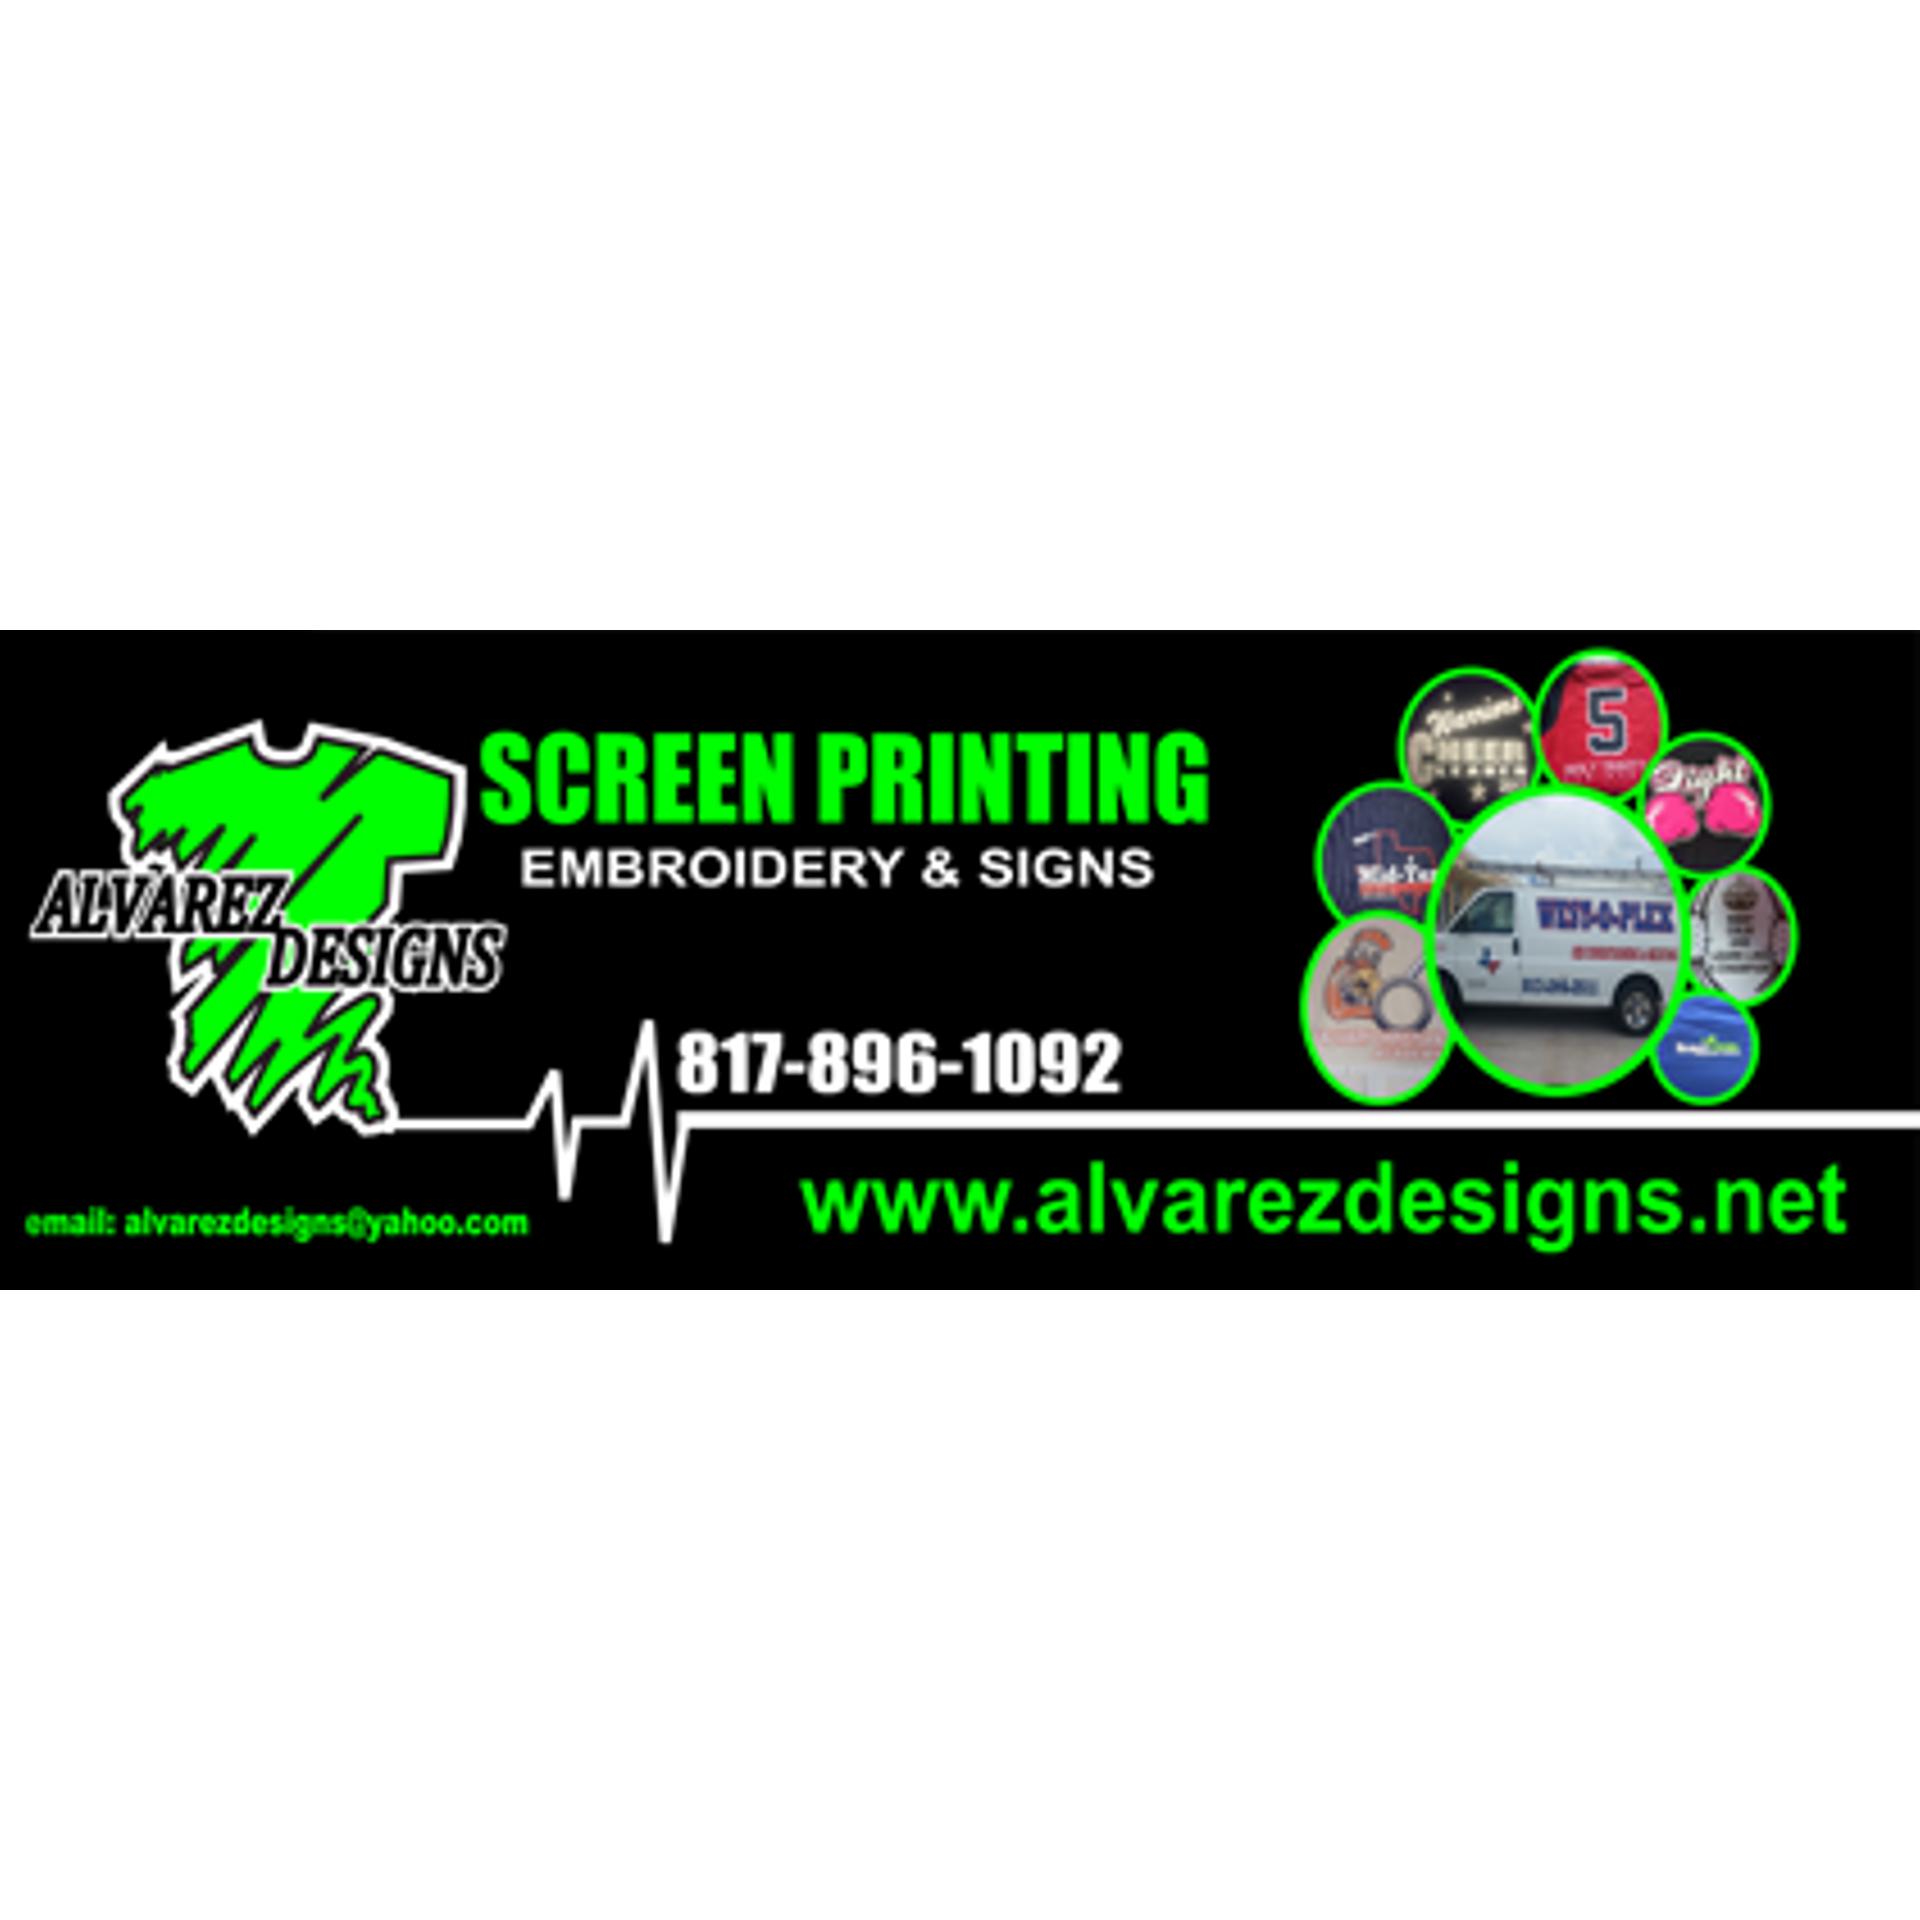 Alvarez Designs - White Settlement, TX - Copying & Printing Services